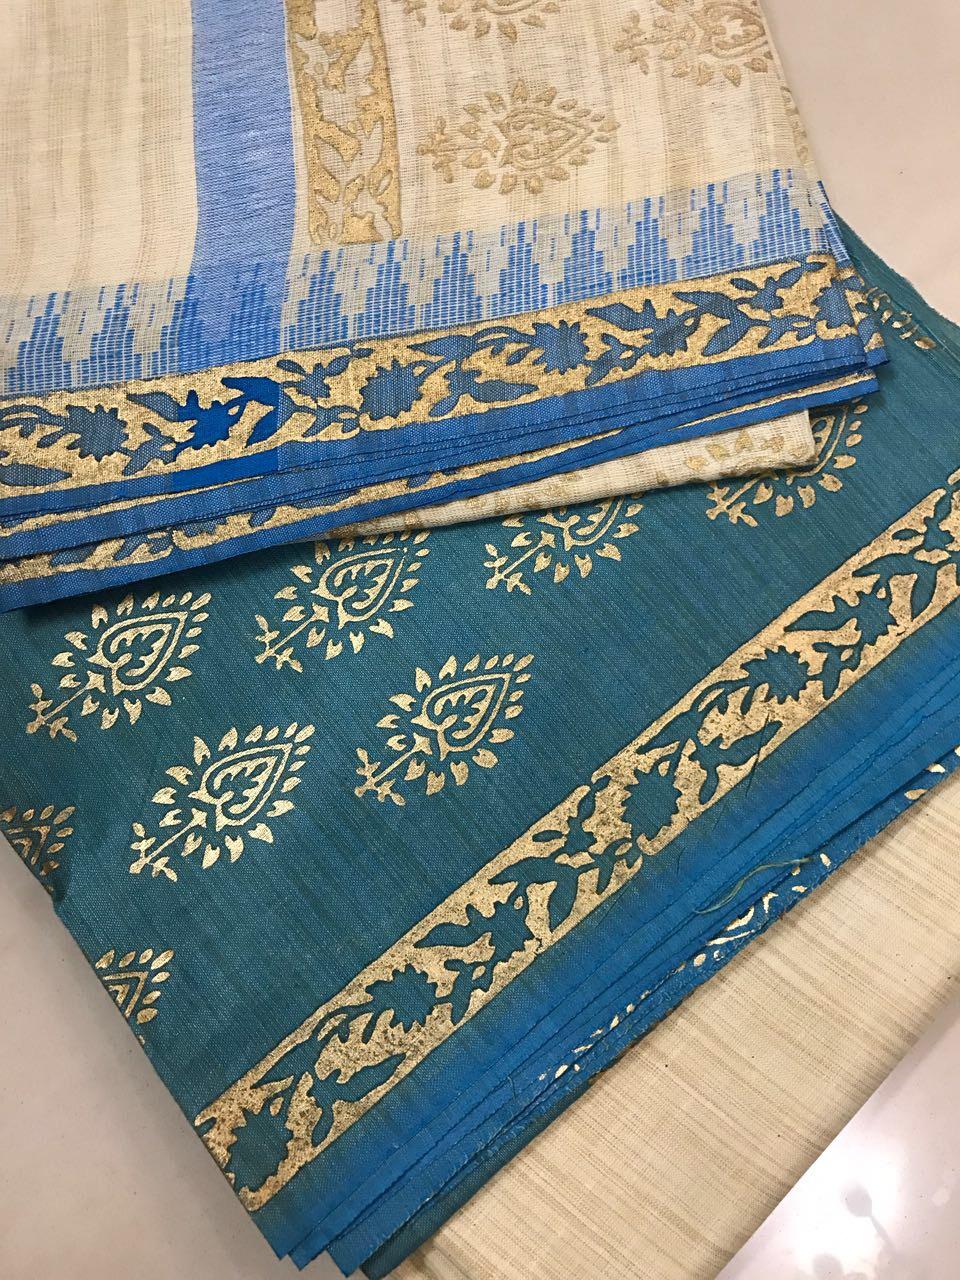 #khadi #handloom #silk #suits @₹1650/-⛵️⛵️👍👍